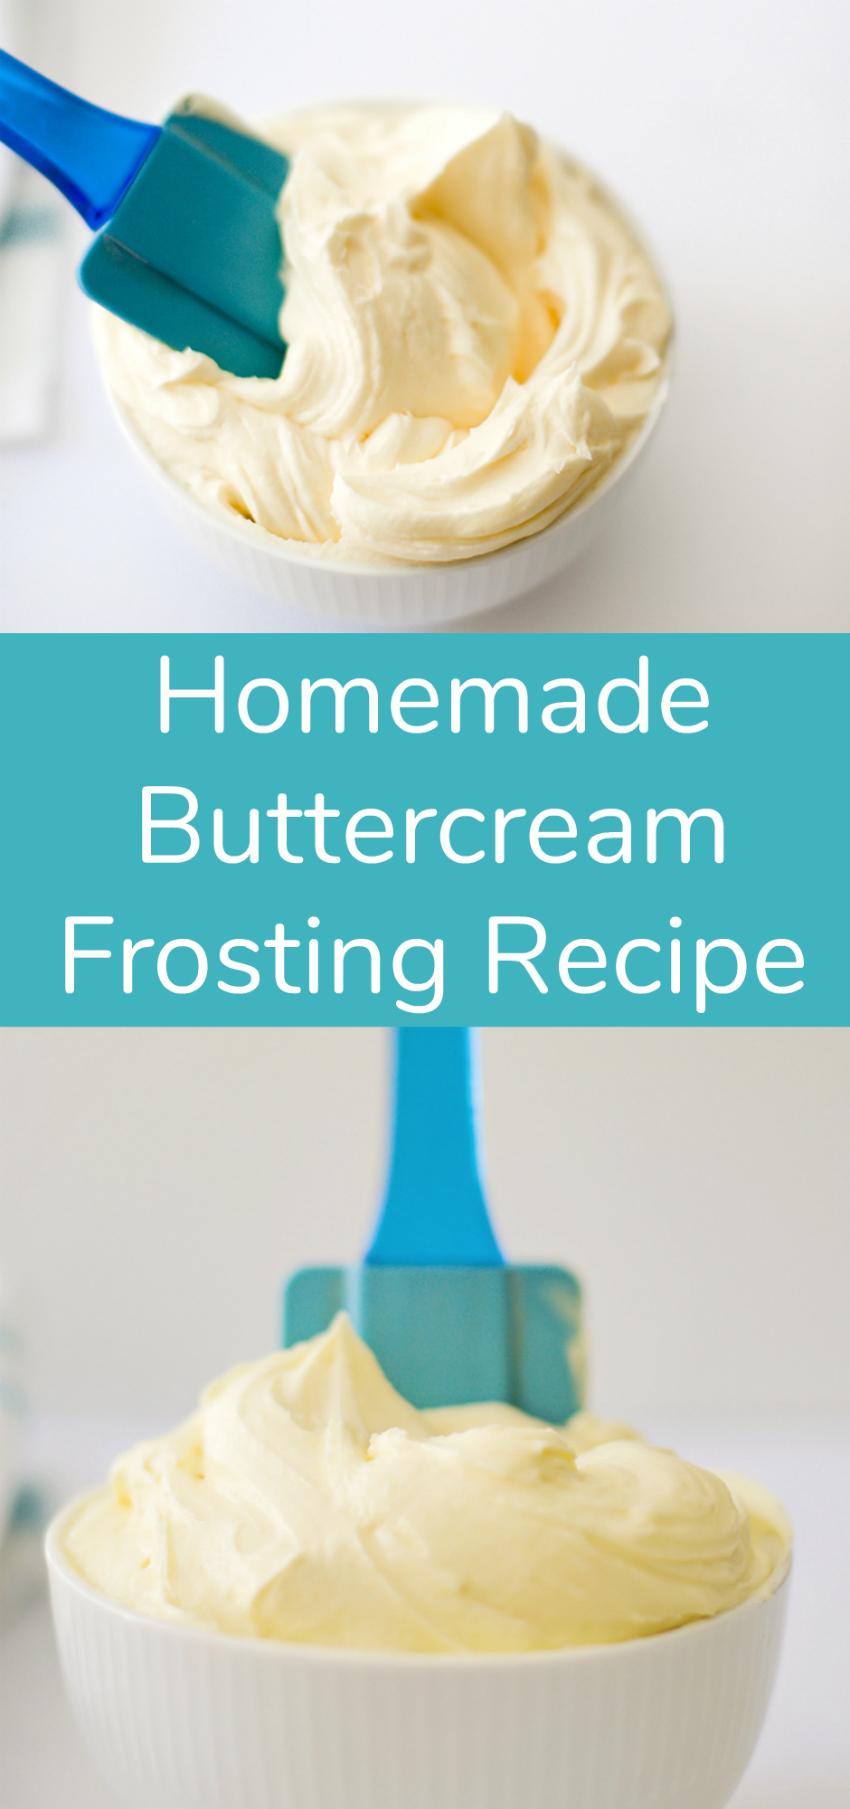 Homemade Buttercream Frosting Recipe